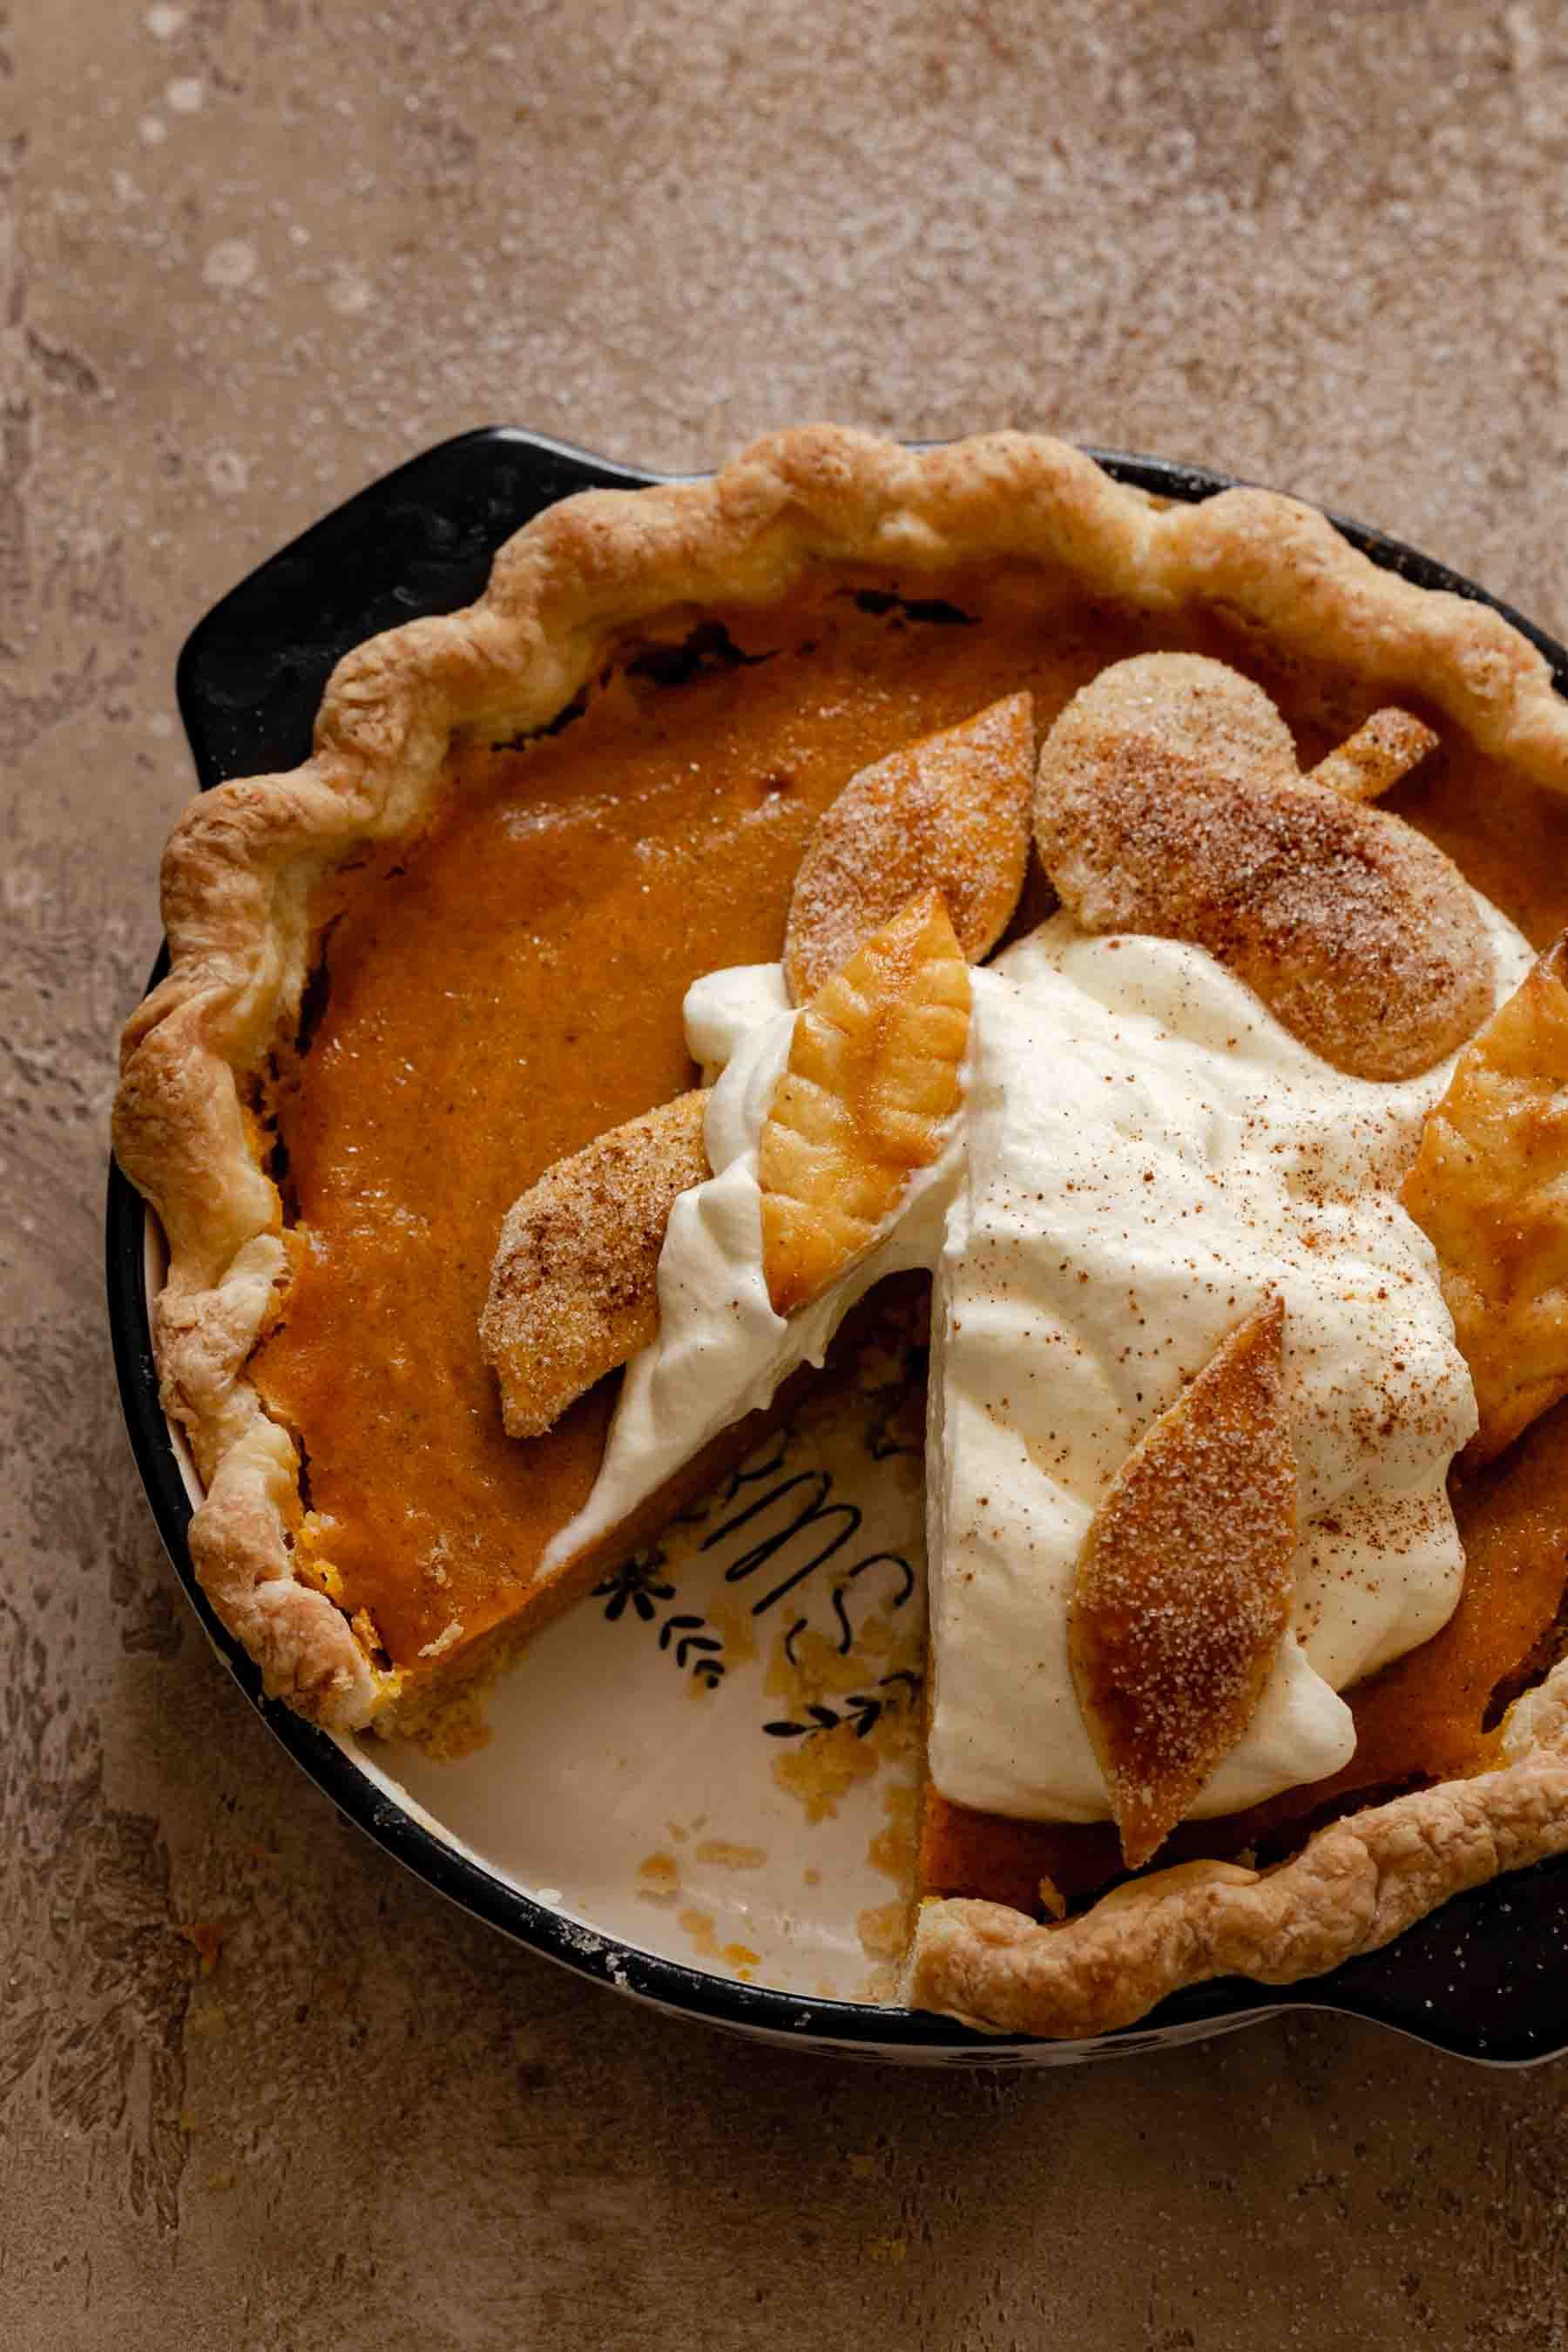 piece of pie sliced out of pumpkin pie